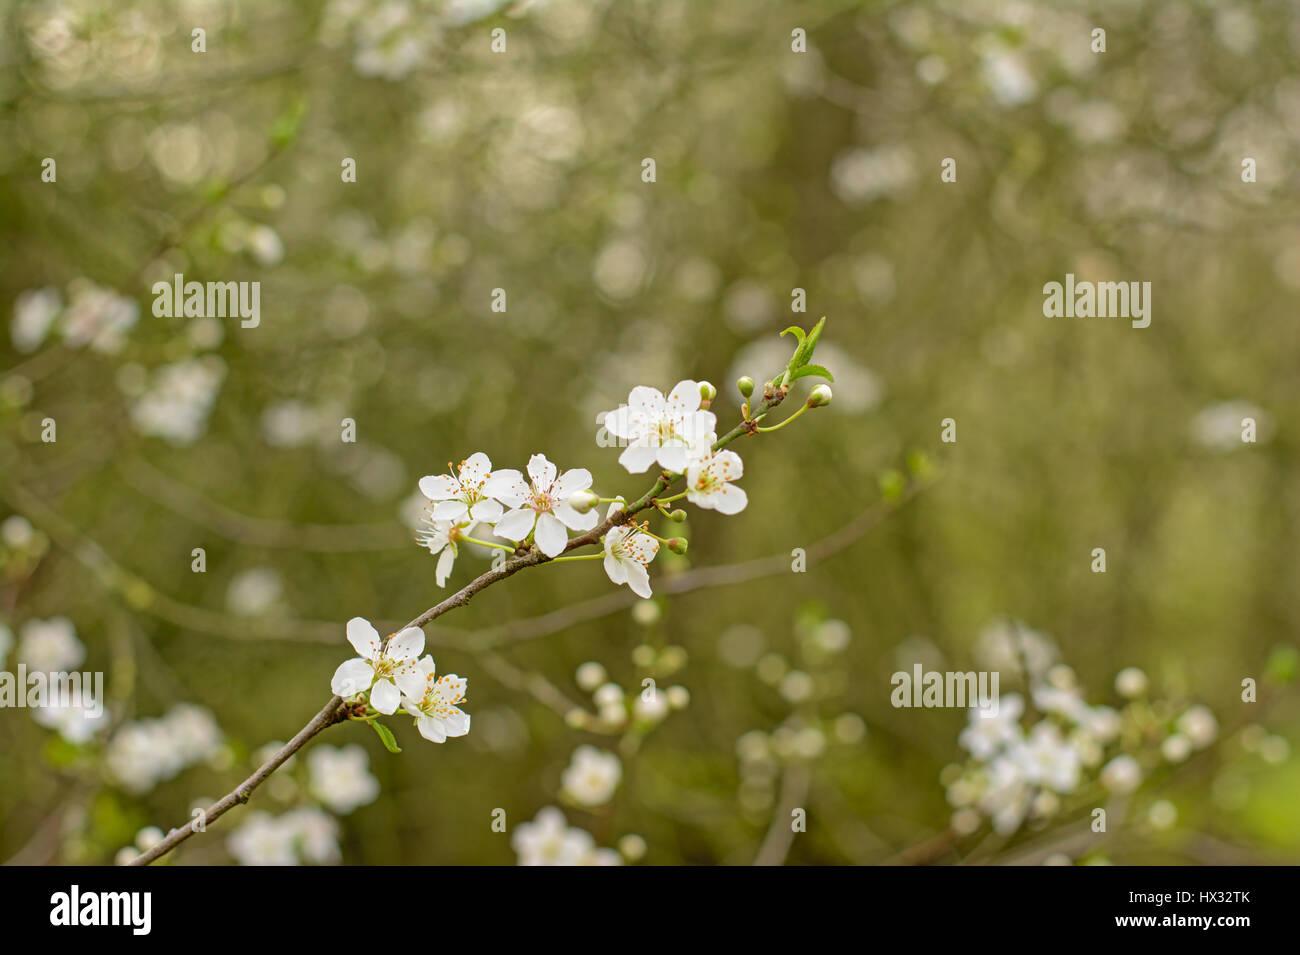 White cherry blossosms in spring on bokeh background, soft light - Stock Image